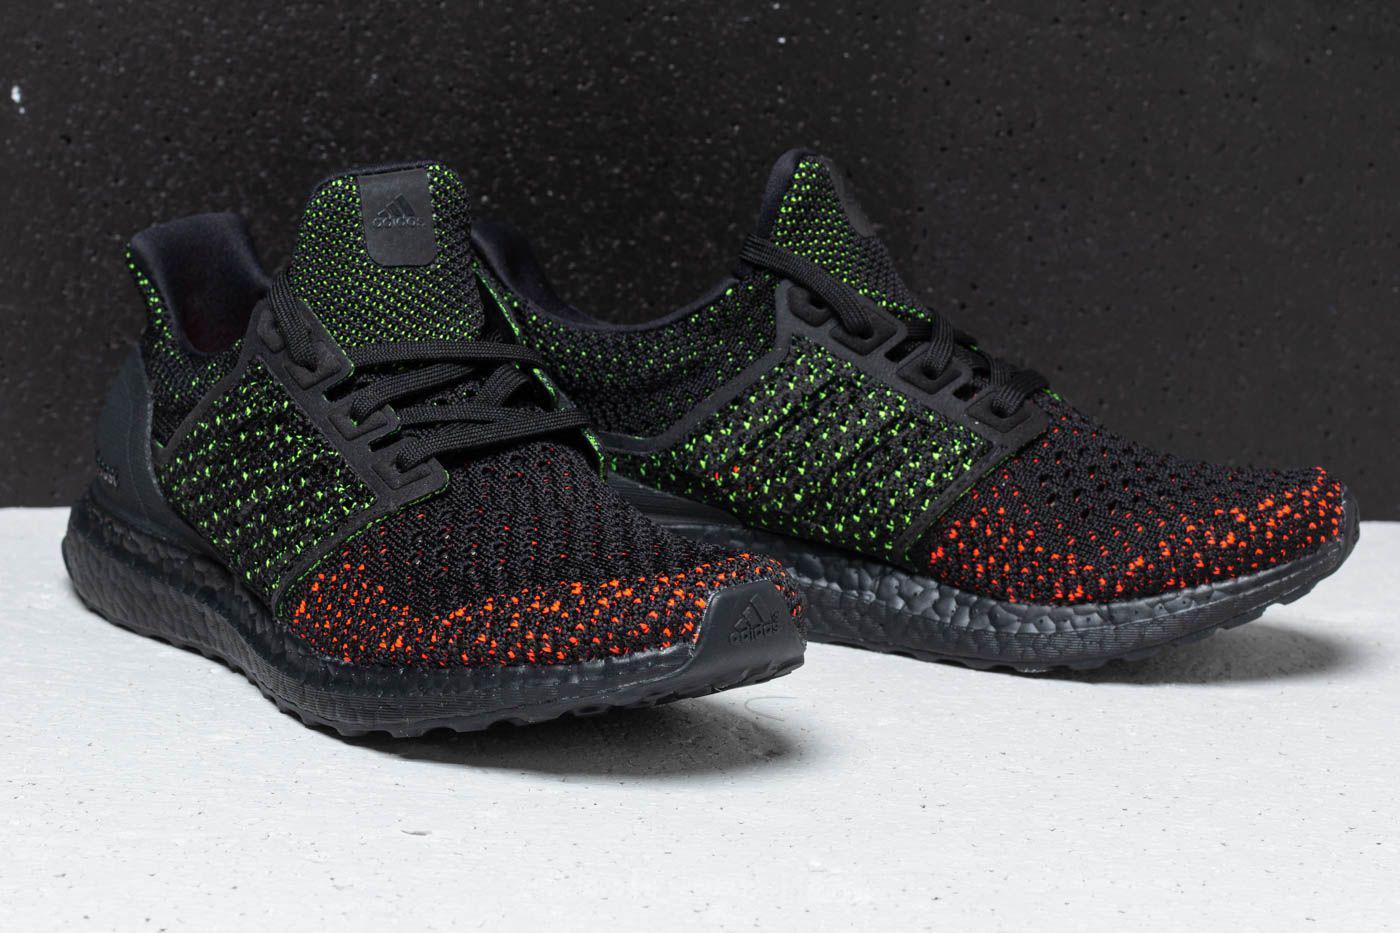 b3ef2edcbca Lyst - Footshop Adidas Ultraboost Clima Core Black  Core Black ...